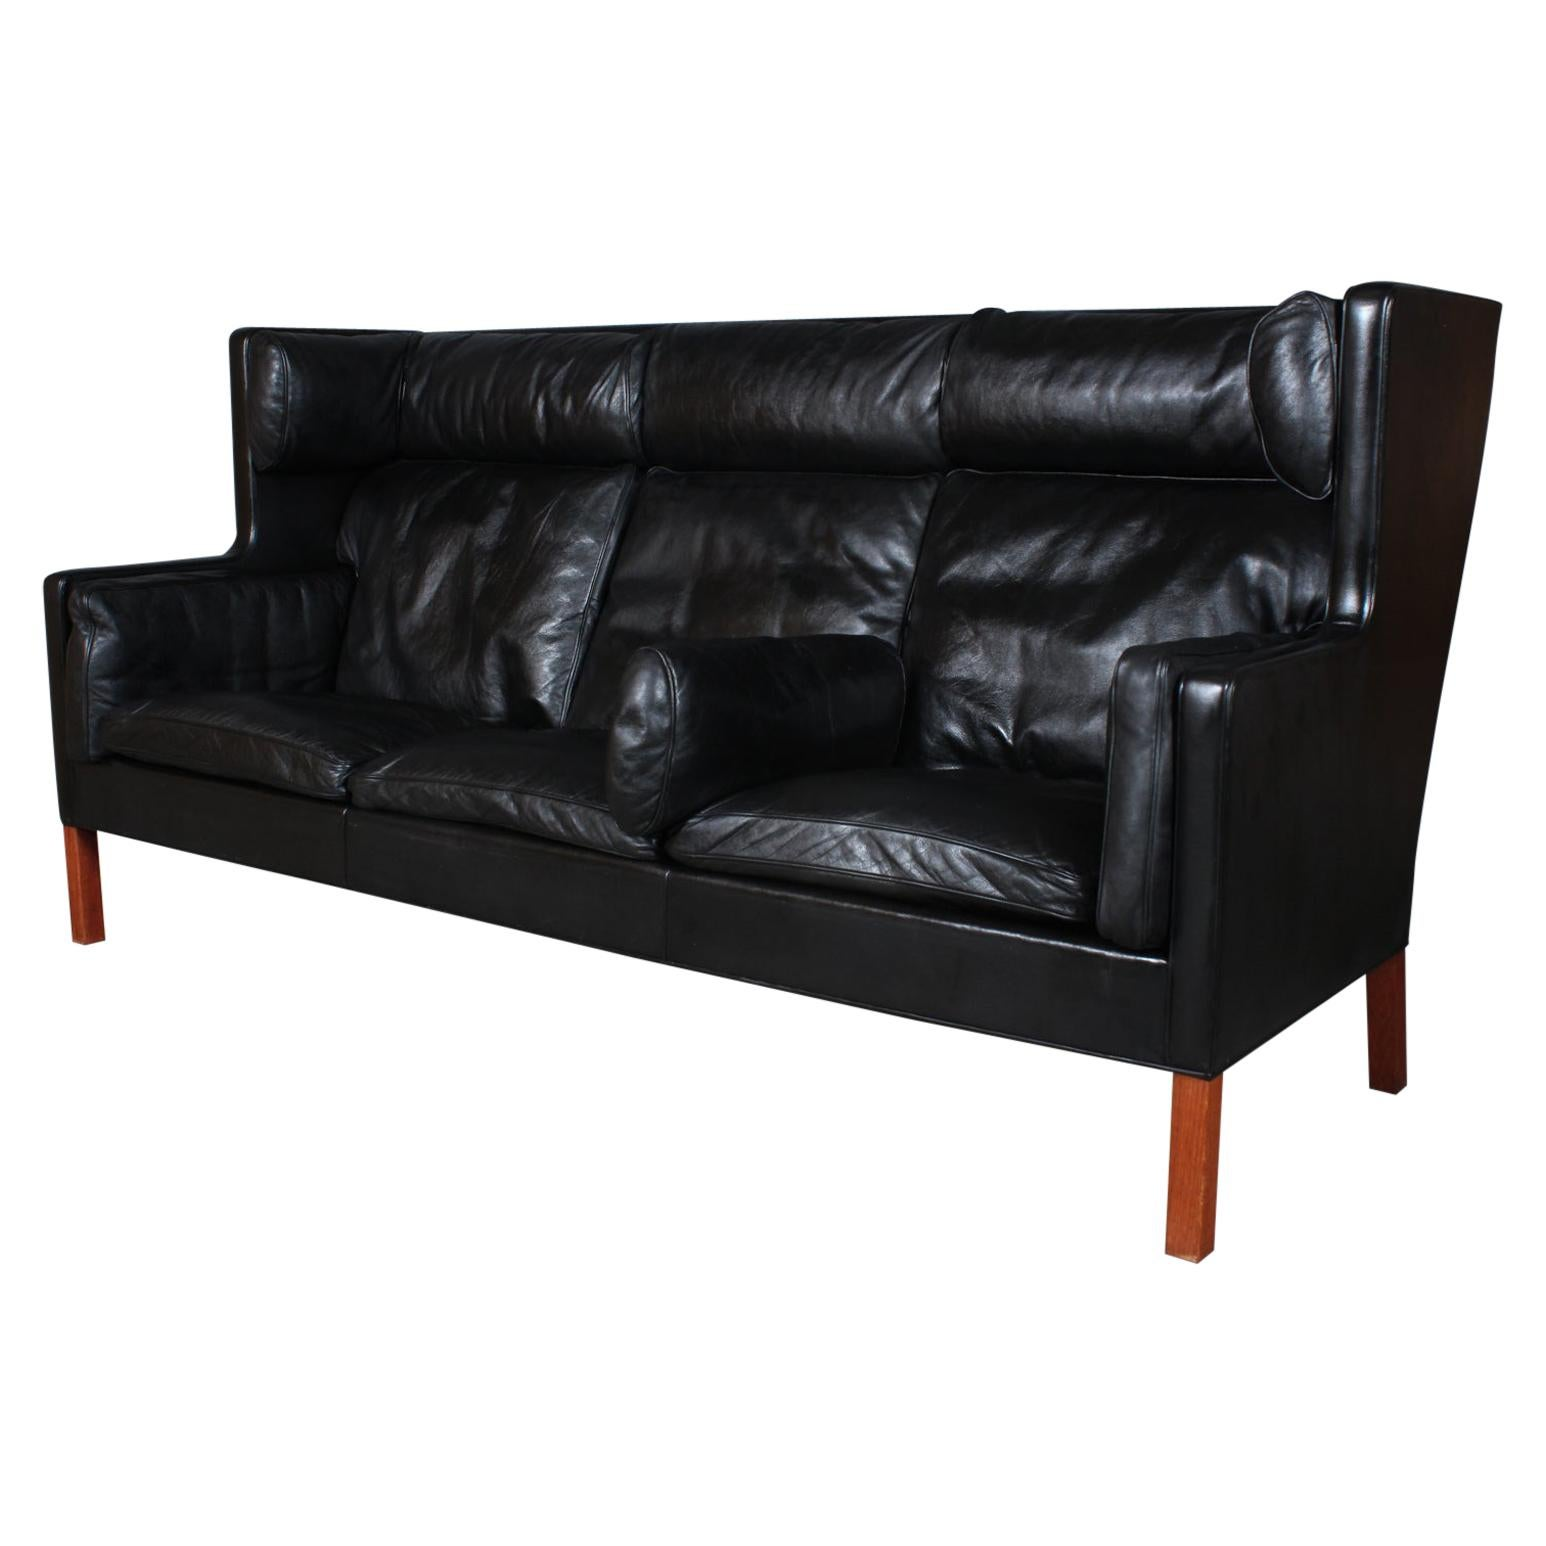 Børge Mogensen Three-Seat Kupé Sofa